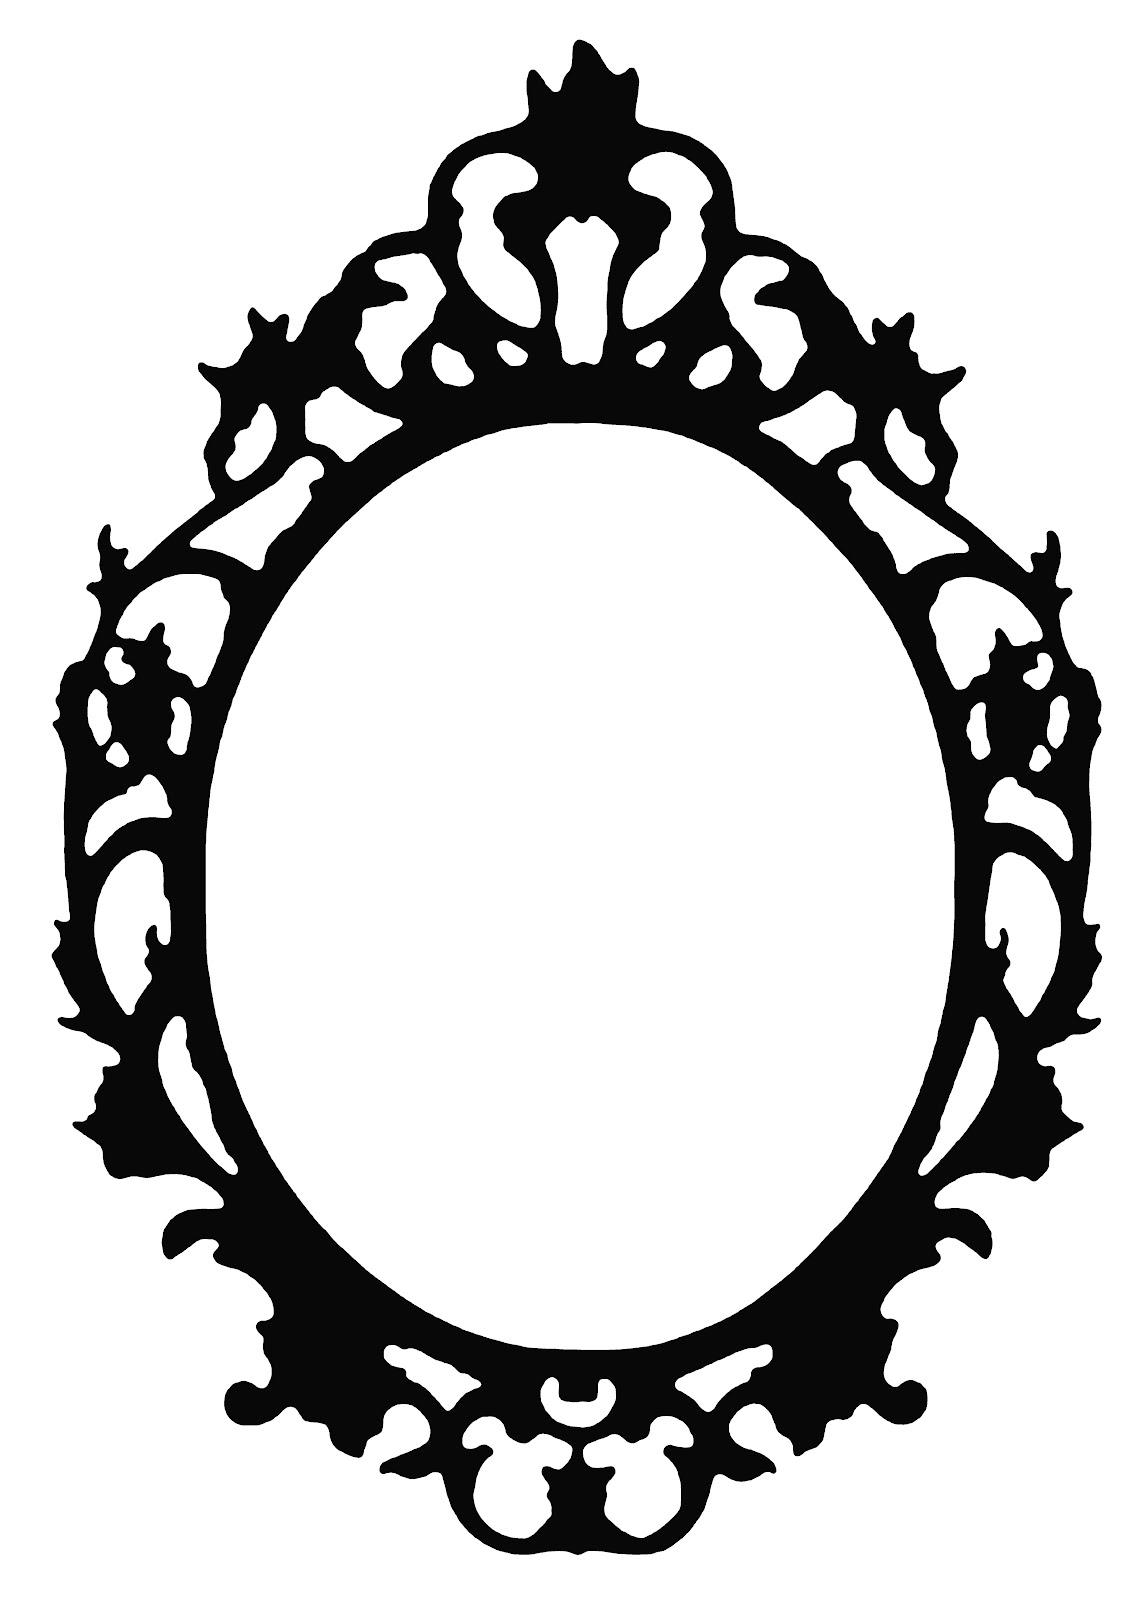 Dibujos de un espejo imagui - Dibujos para espejos ...